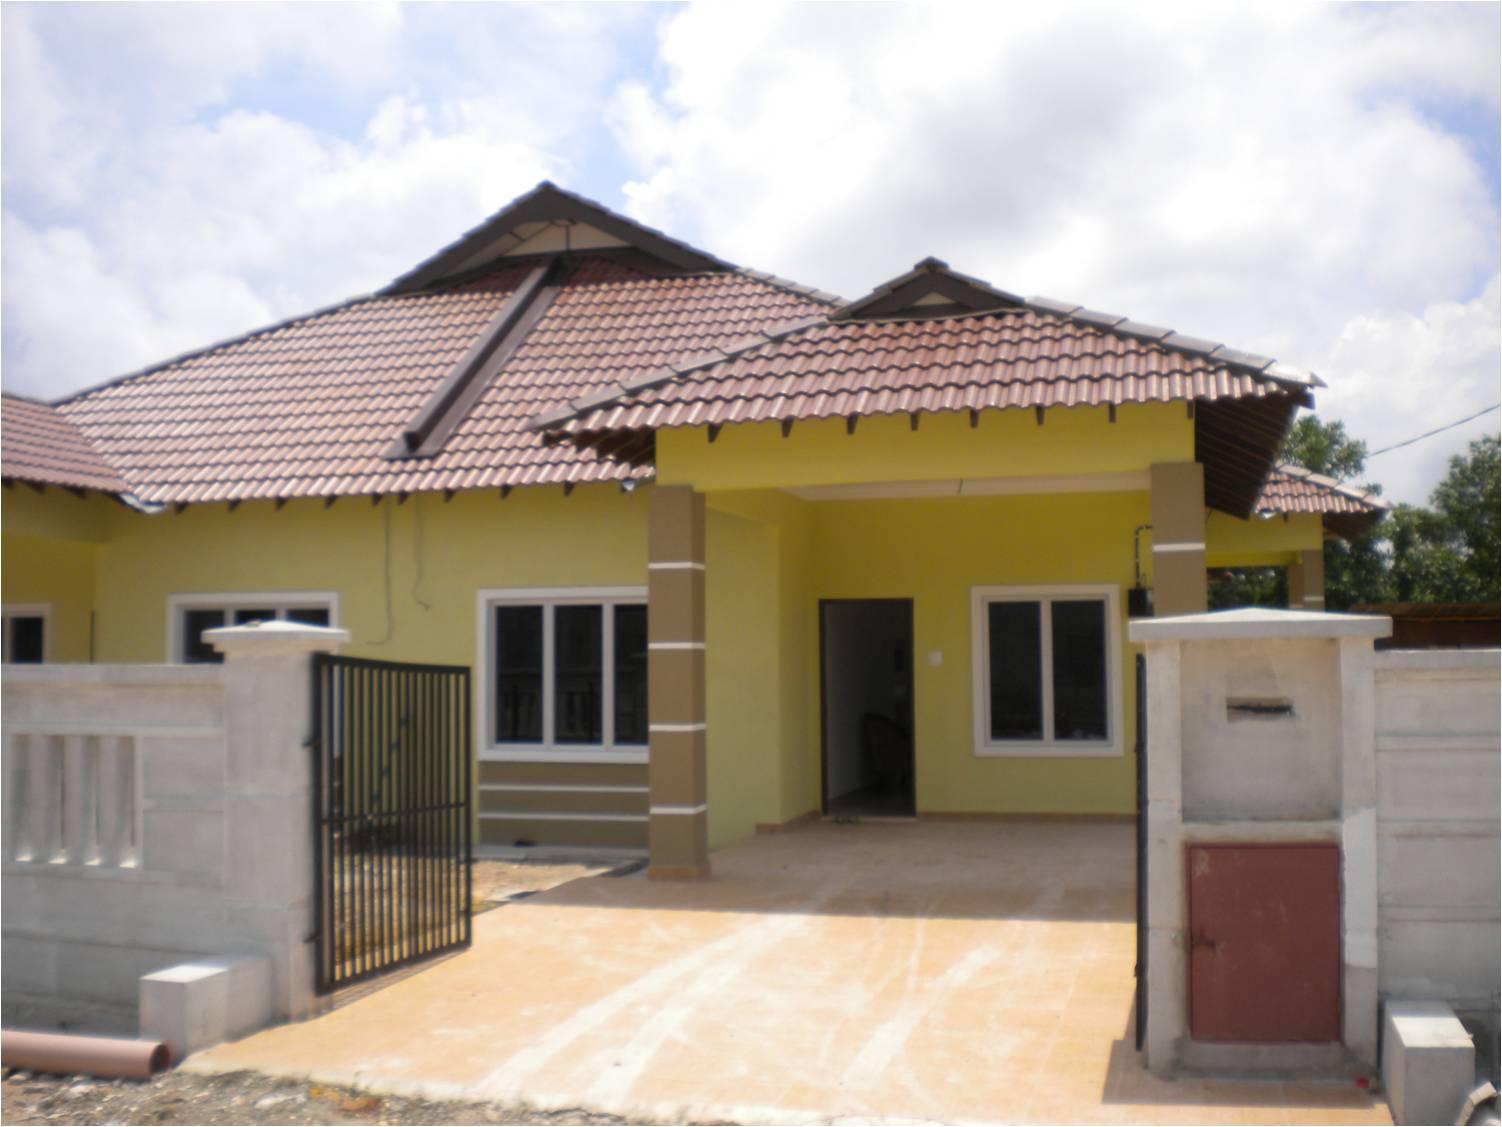 pelan ubahsuai rumah semid setingkat ask home design